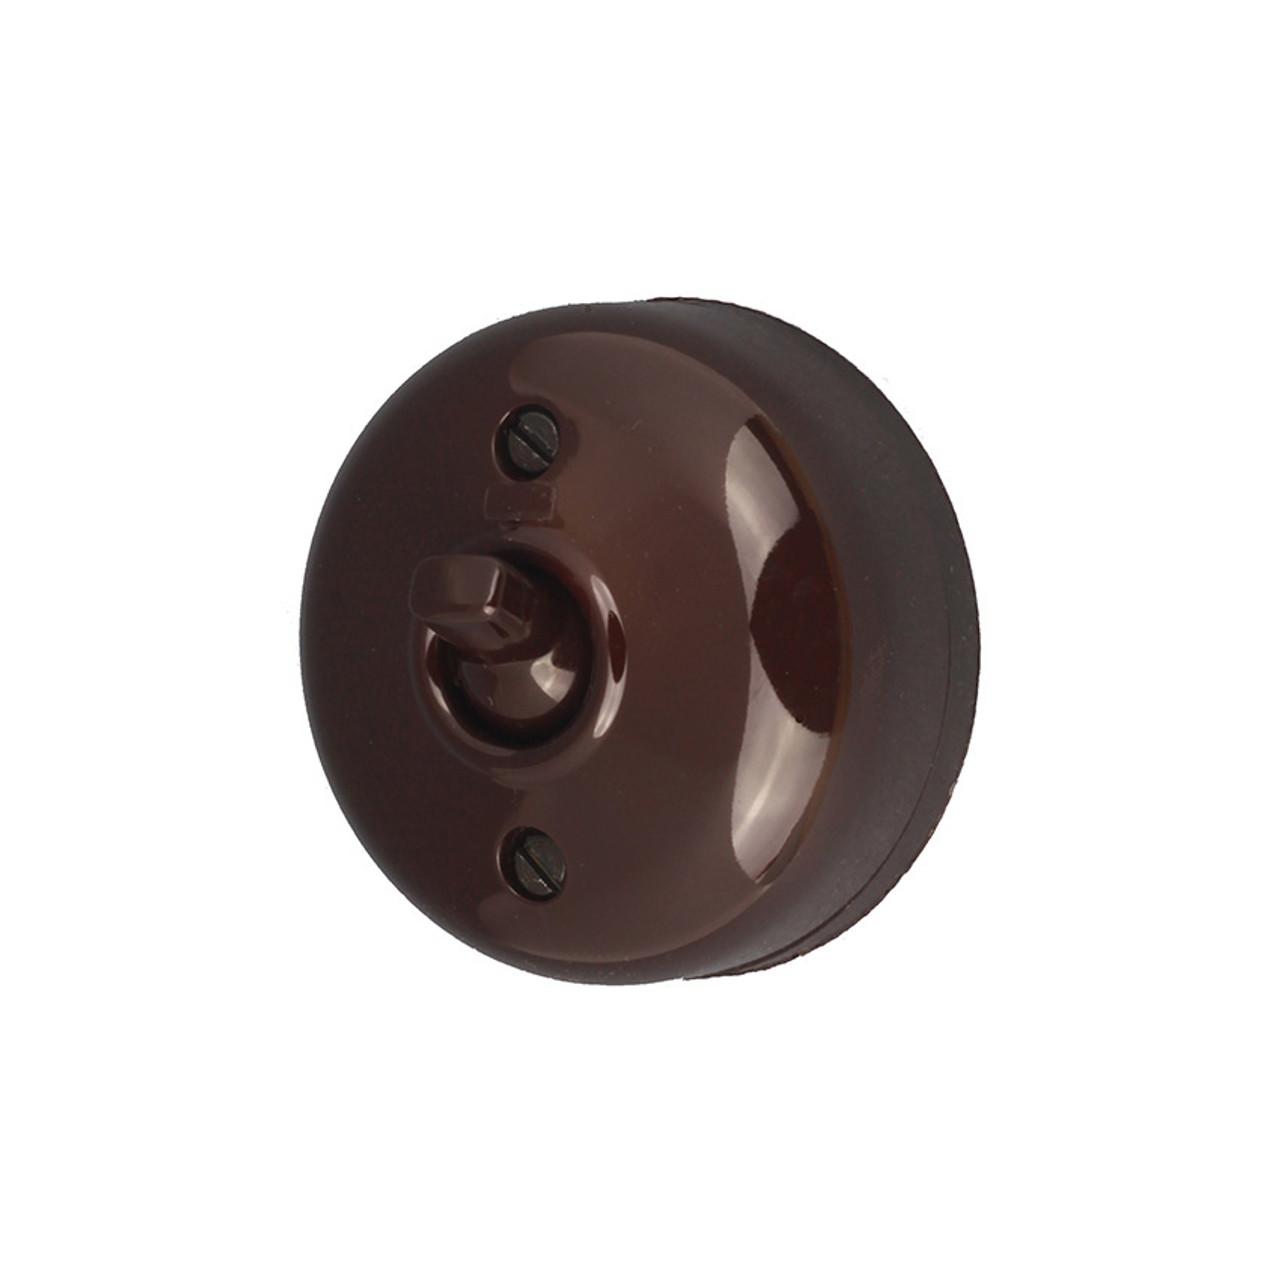 Brown Bakelite Switch